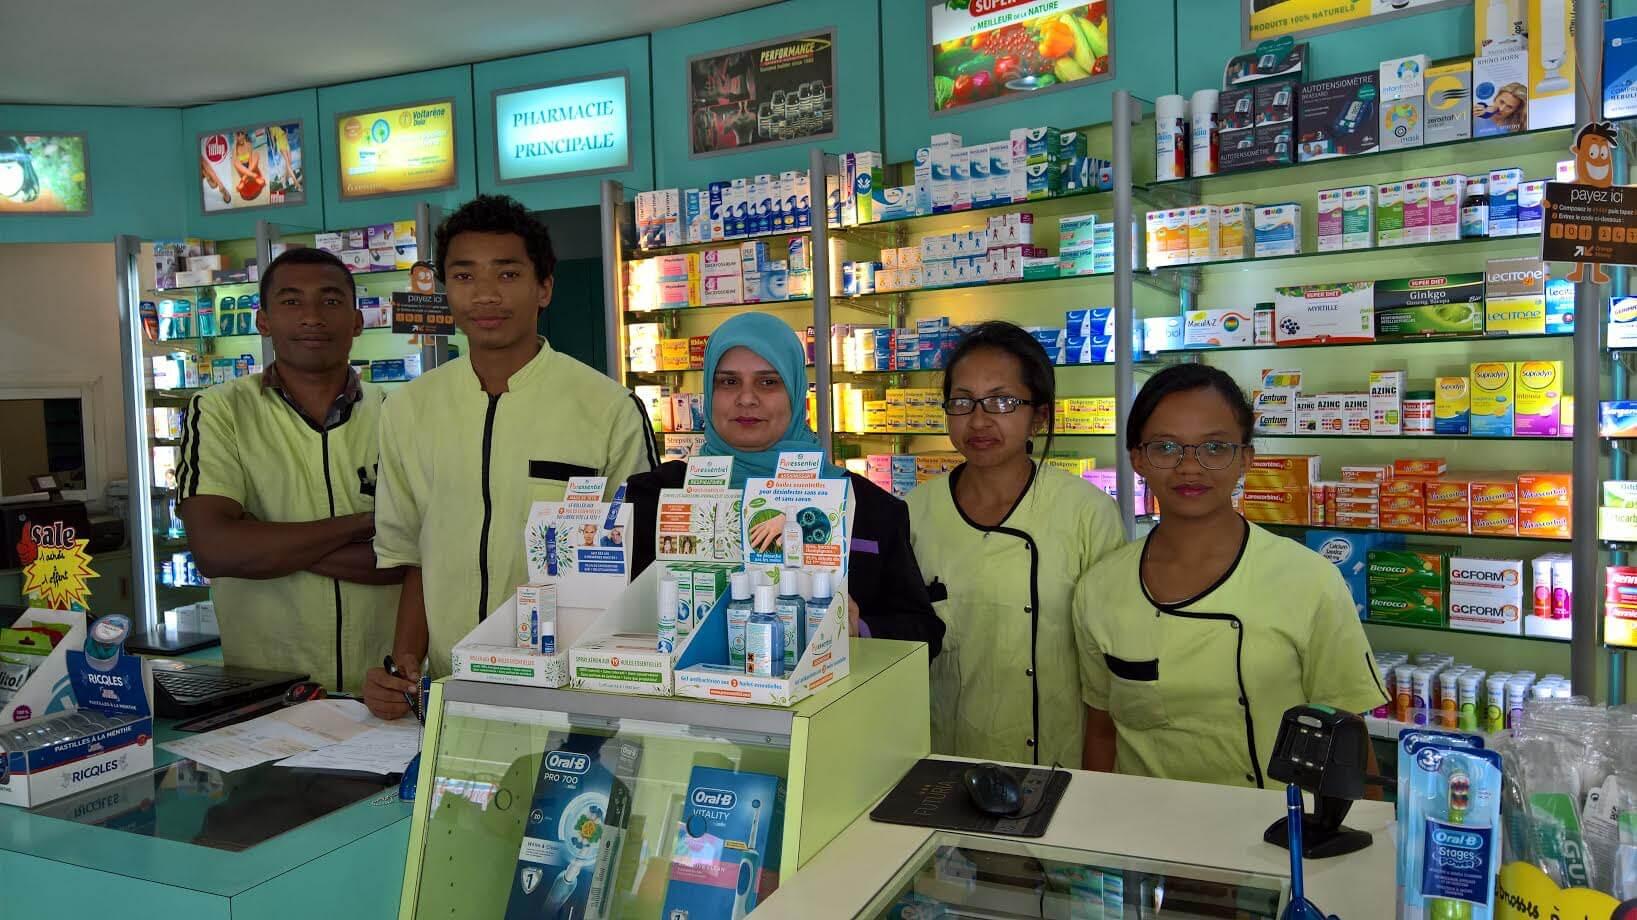 Pharmacie Principale Madagascar IN'OYA